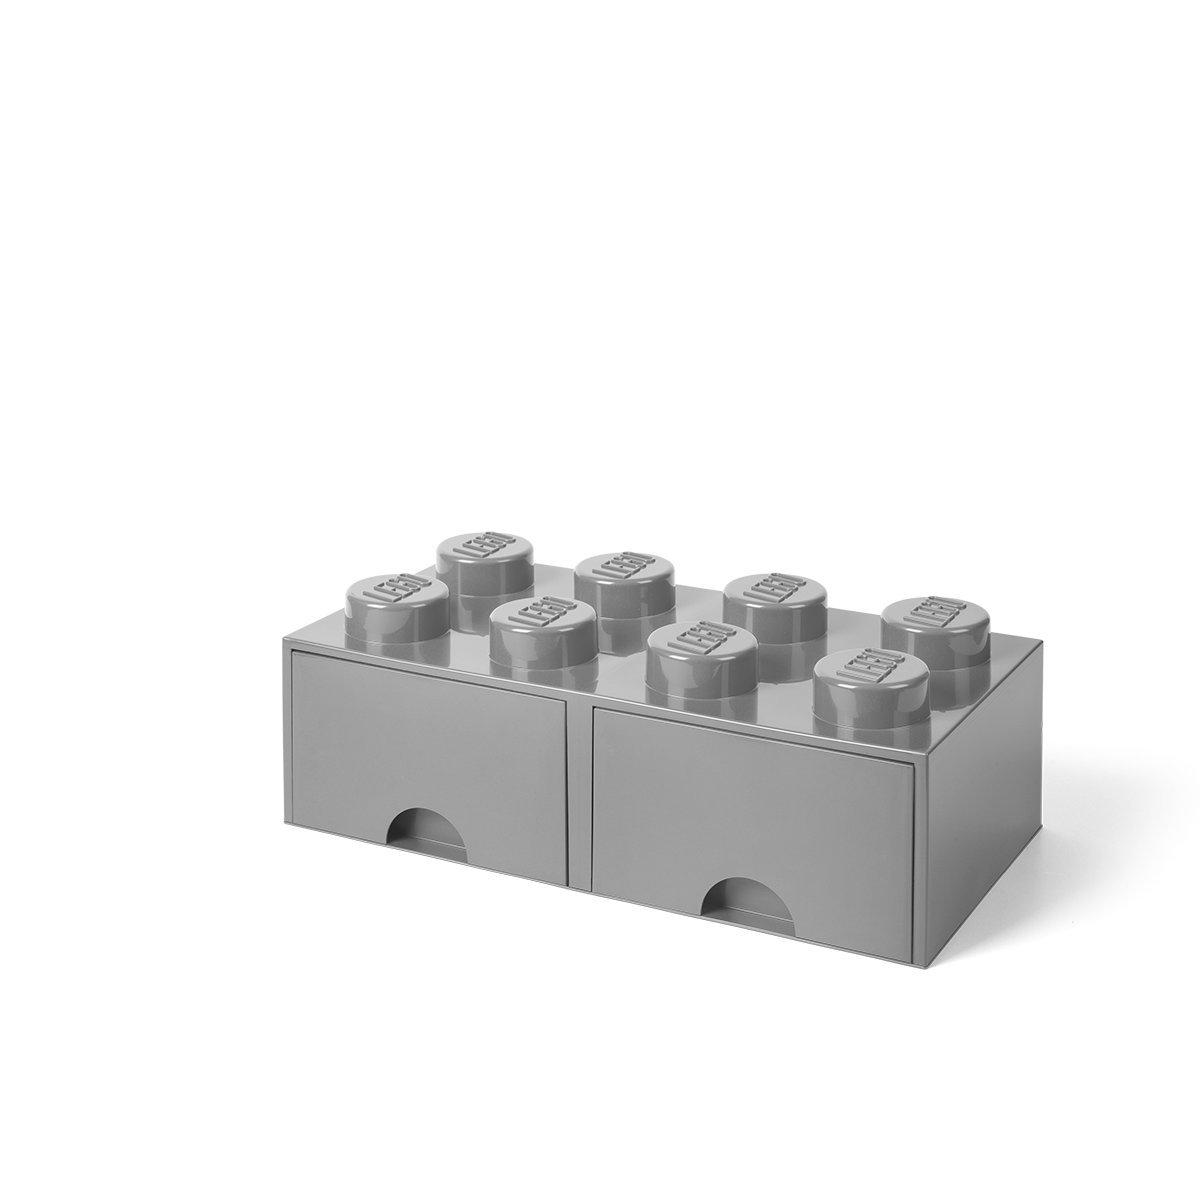 LEGO Brick Drawer, 8 Knobs, 2 Drawers, Stackable Storage Box, Medium Stone Grey